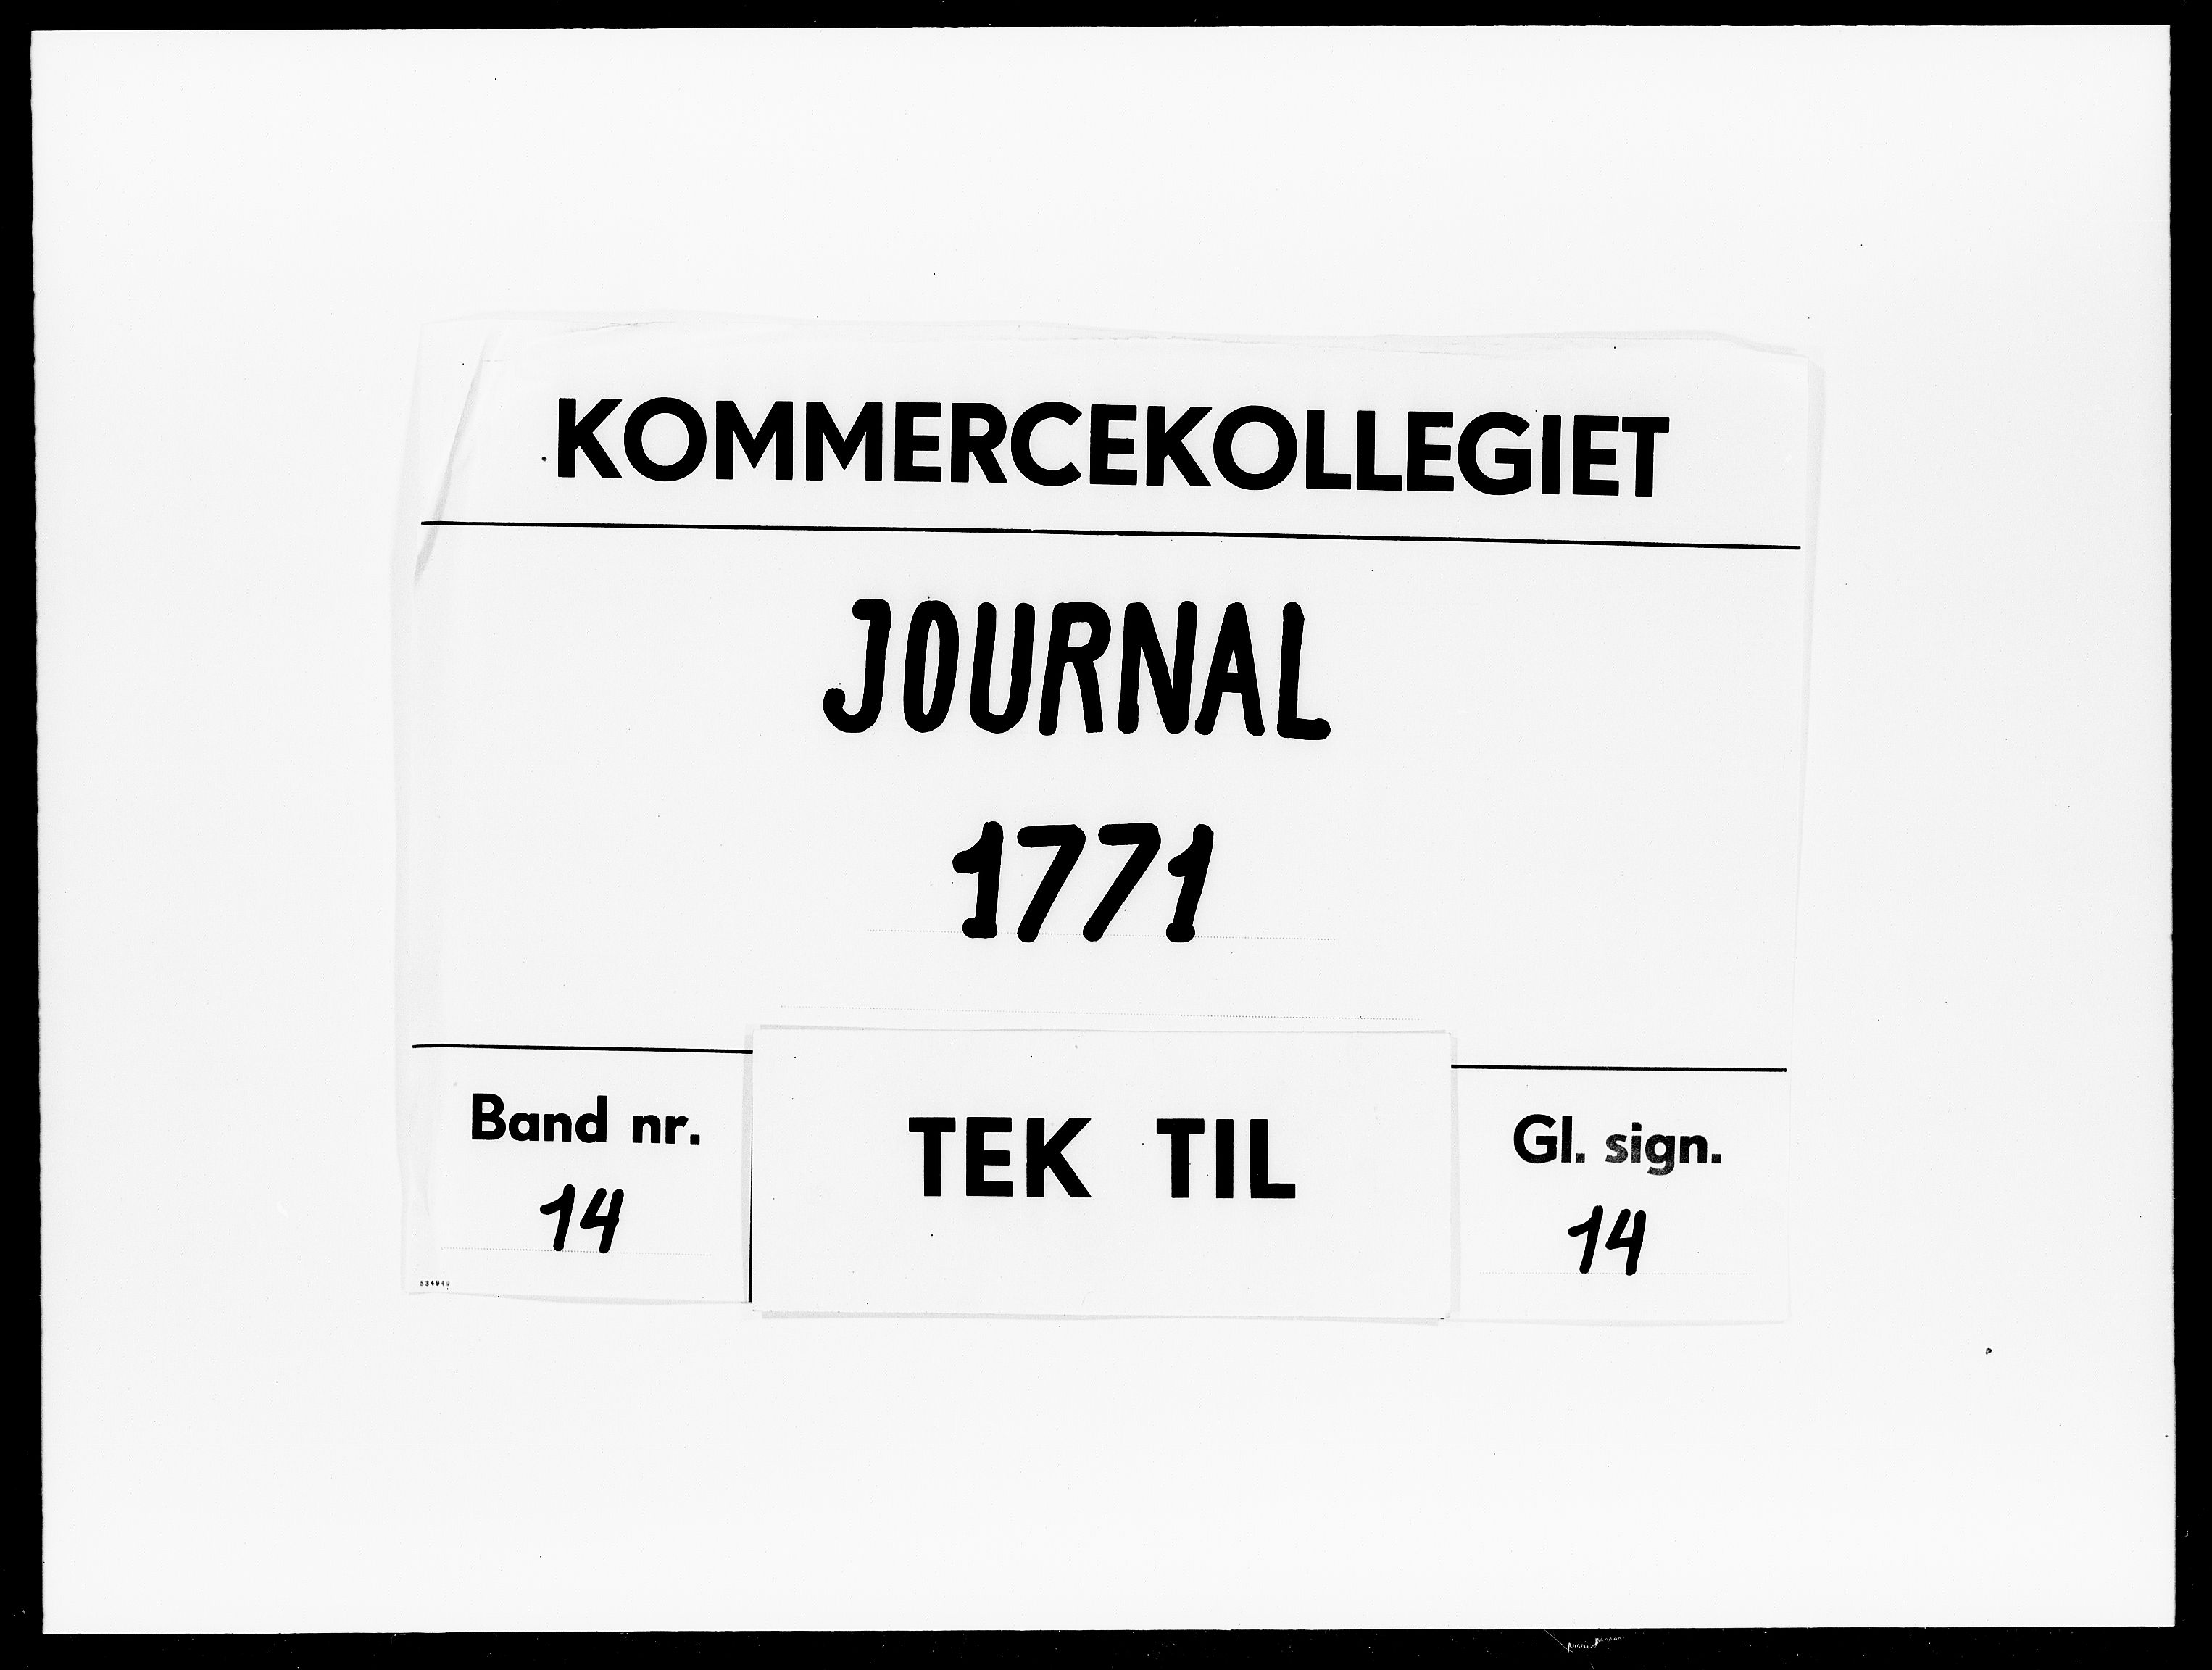 DRA, Kommercekollegiet, Dansk-Norske Sekretariat, -/62: Journal nr. 14, 1771